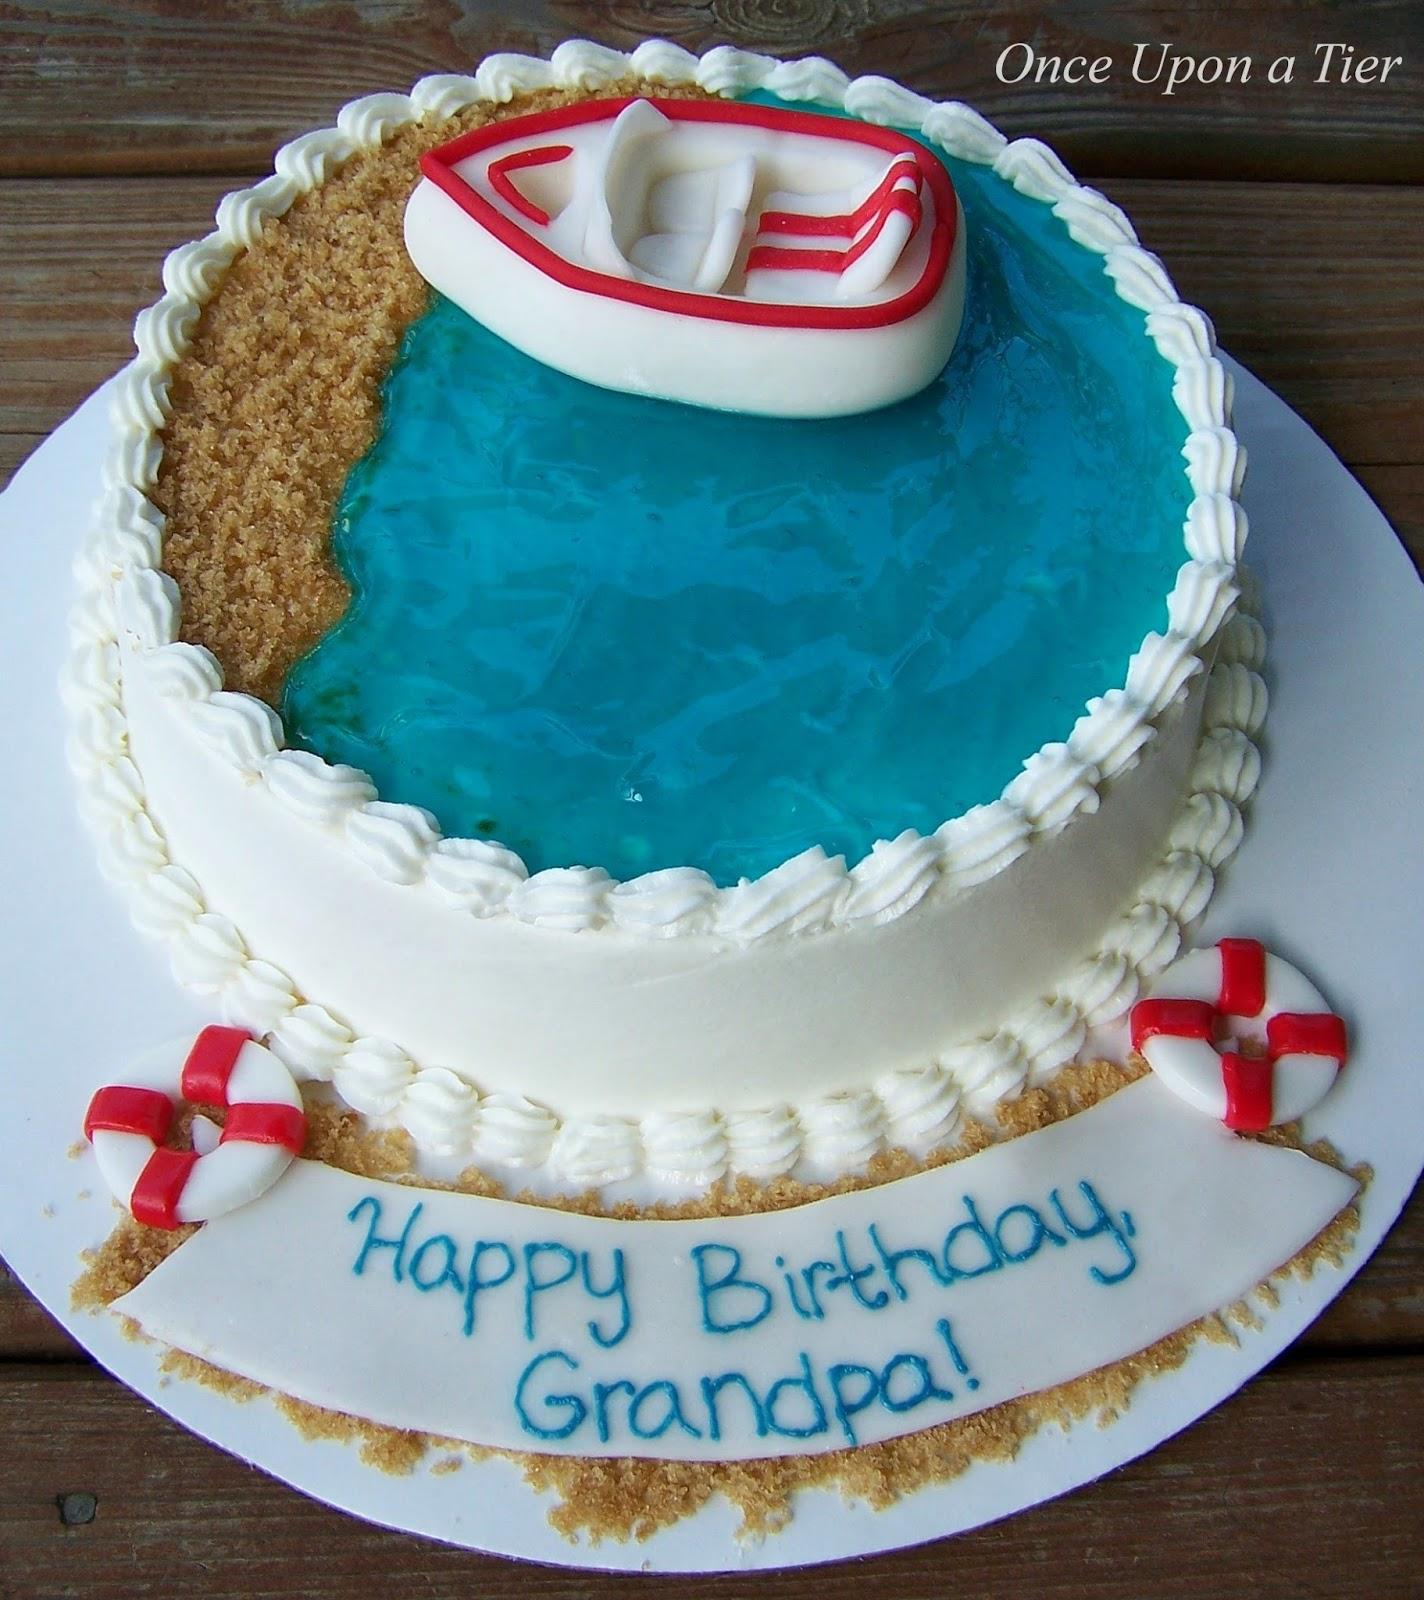 Grandpa Birthday Cake 100th birthday cake ribbon